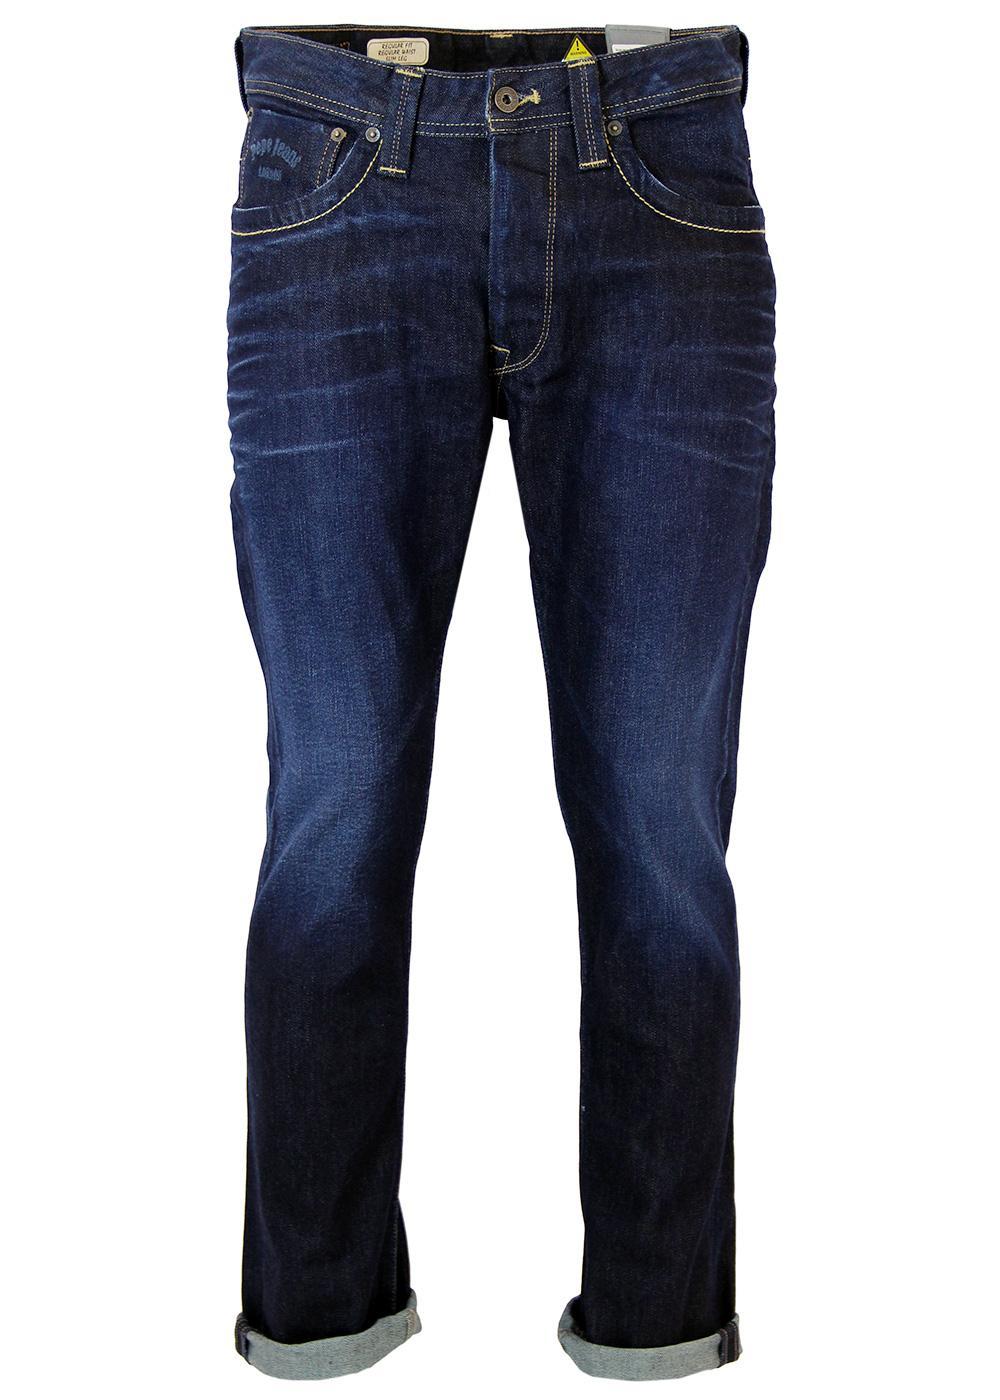 Cash PEPE JEANS Retro Mod Slim Leg Indie Jeans